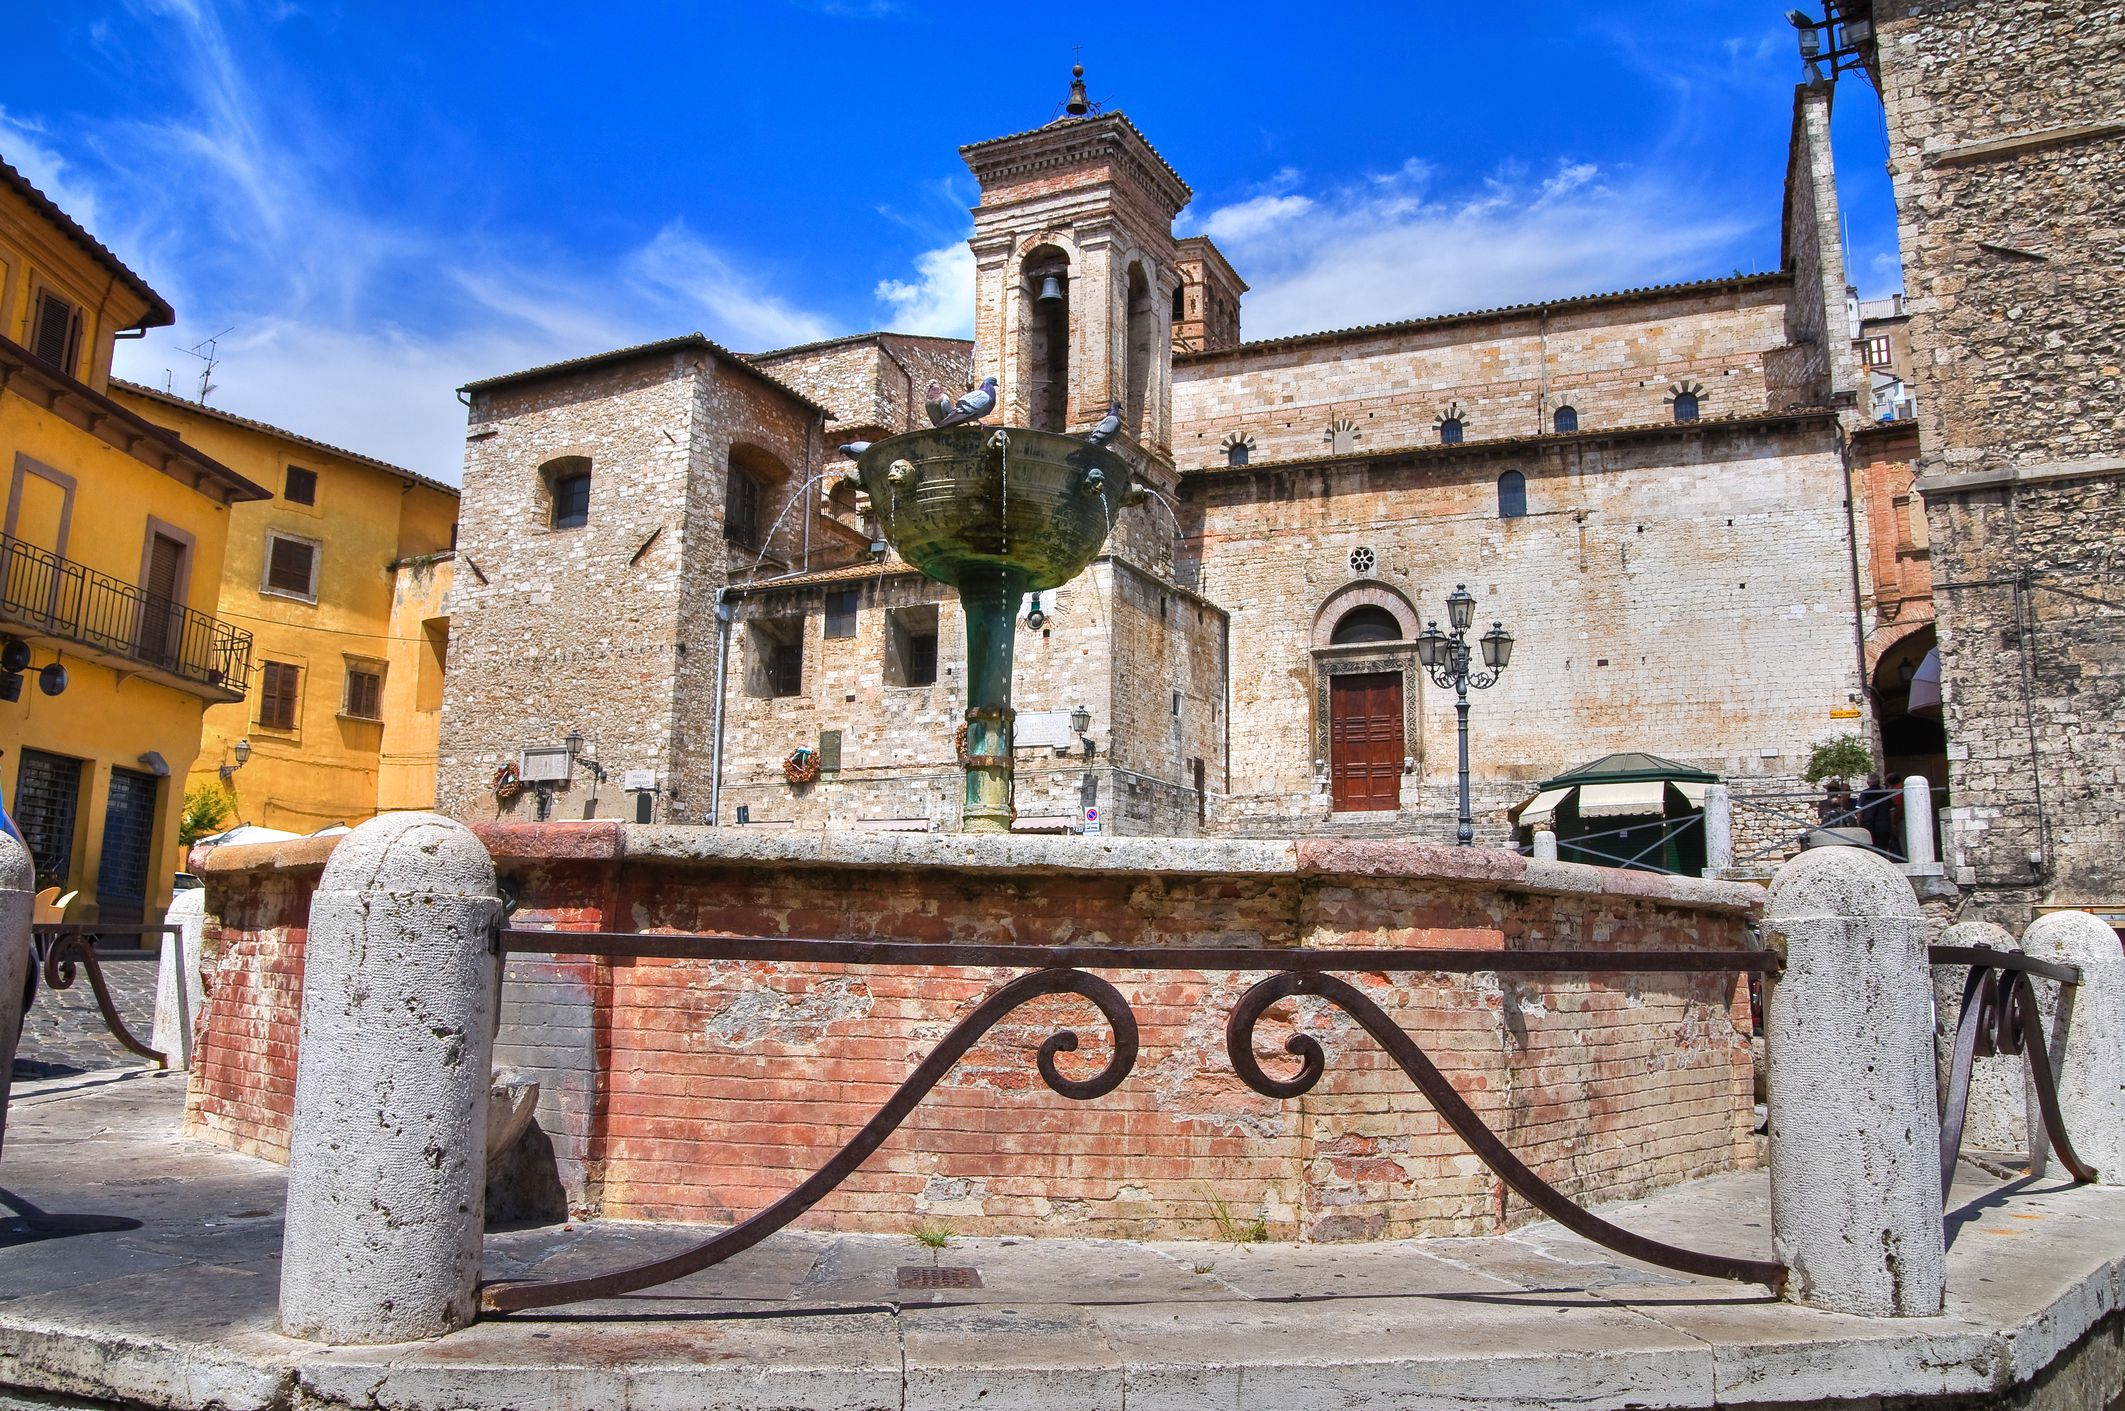 Monumental fountain, Narni, Umbria, Italy